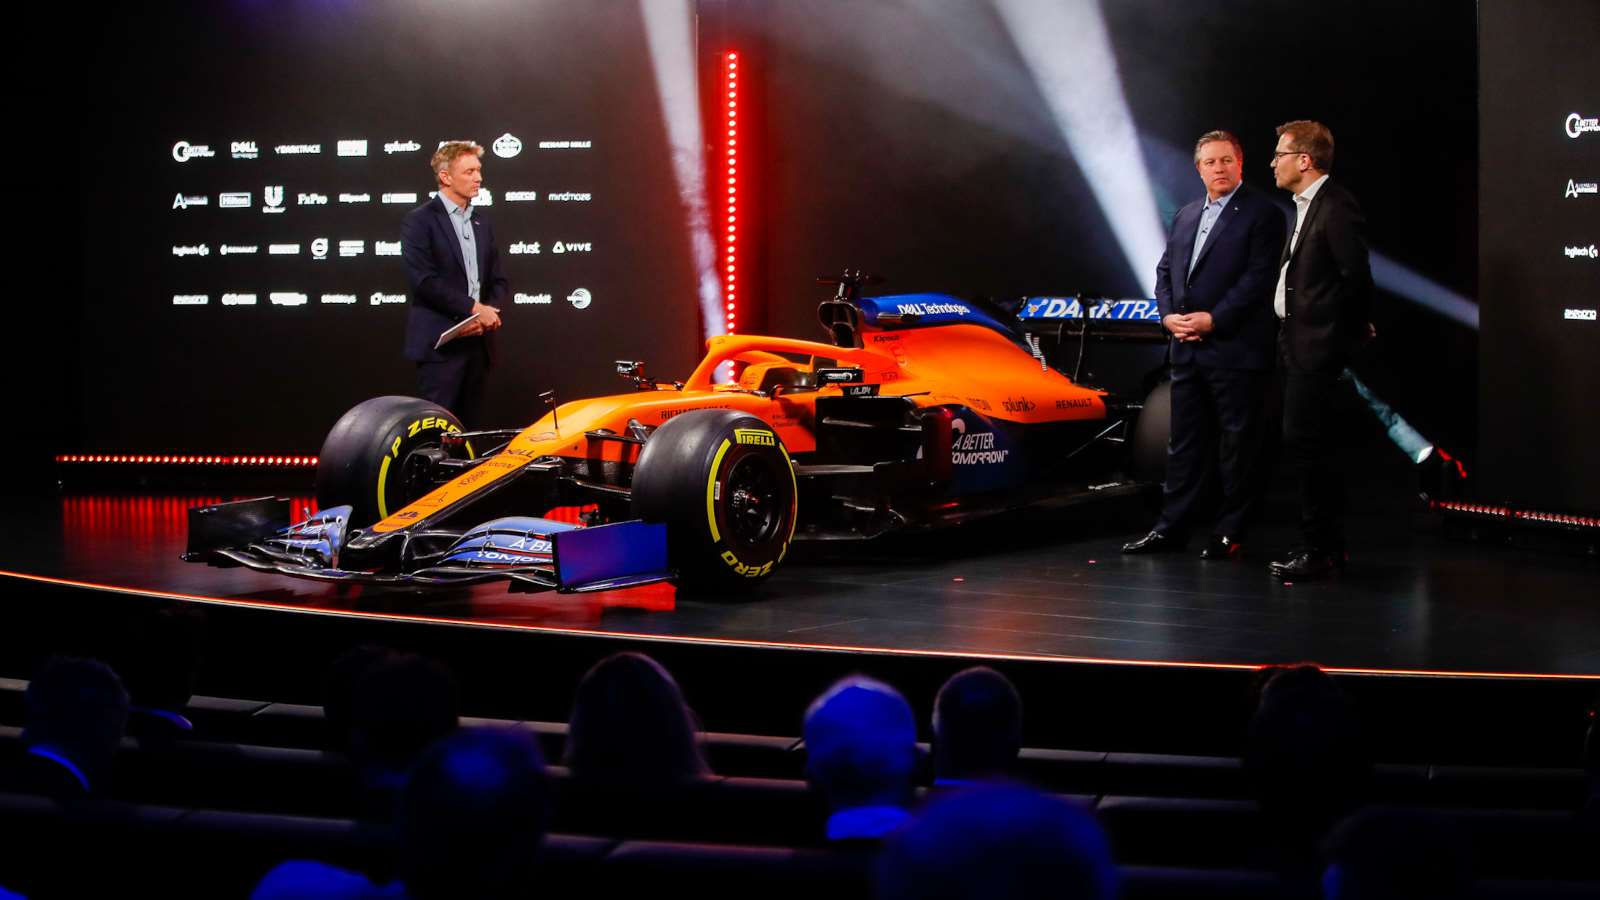 Gallery] The McLaren MCL35 2020 Formula 1 car GRR 1600x900